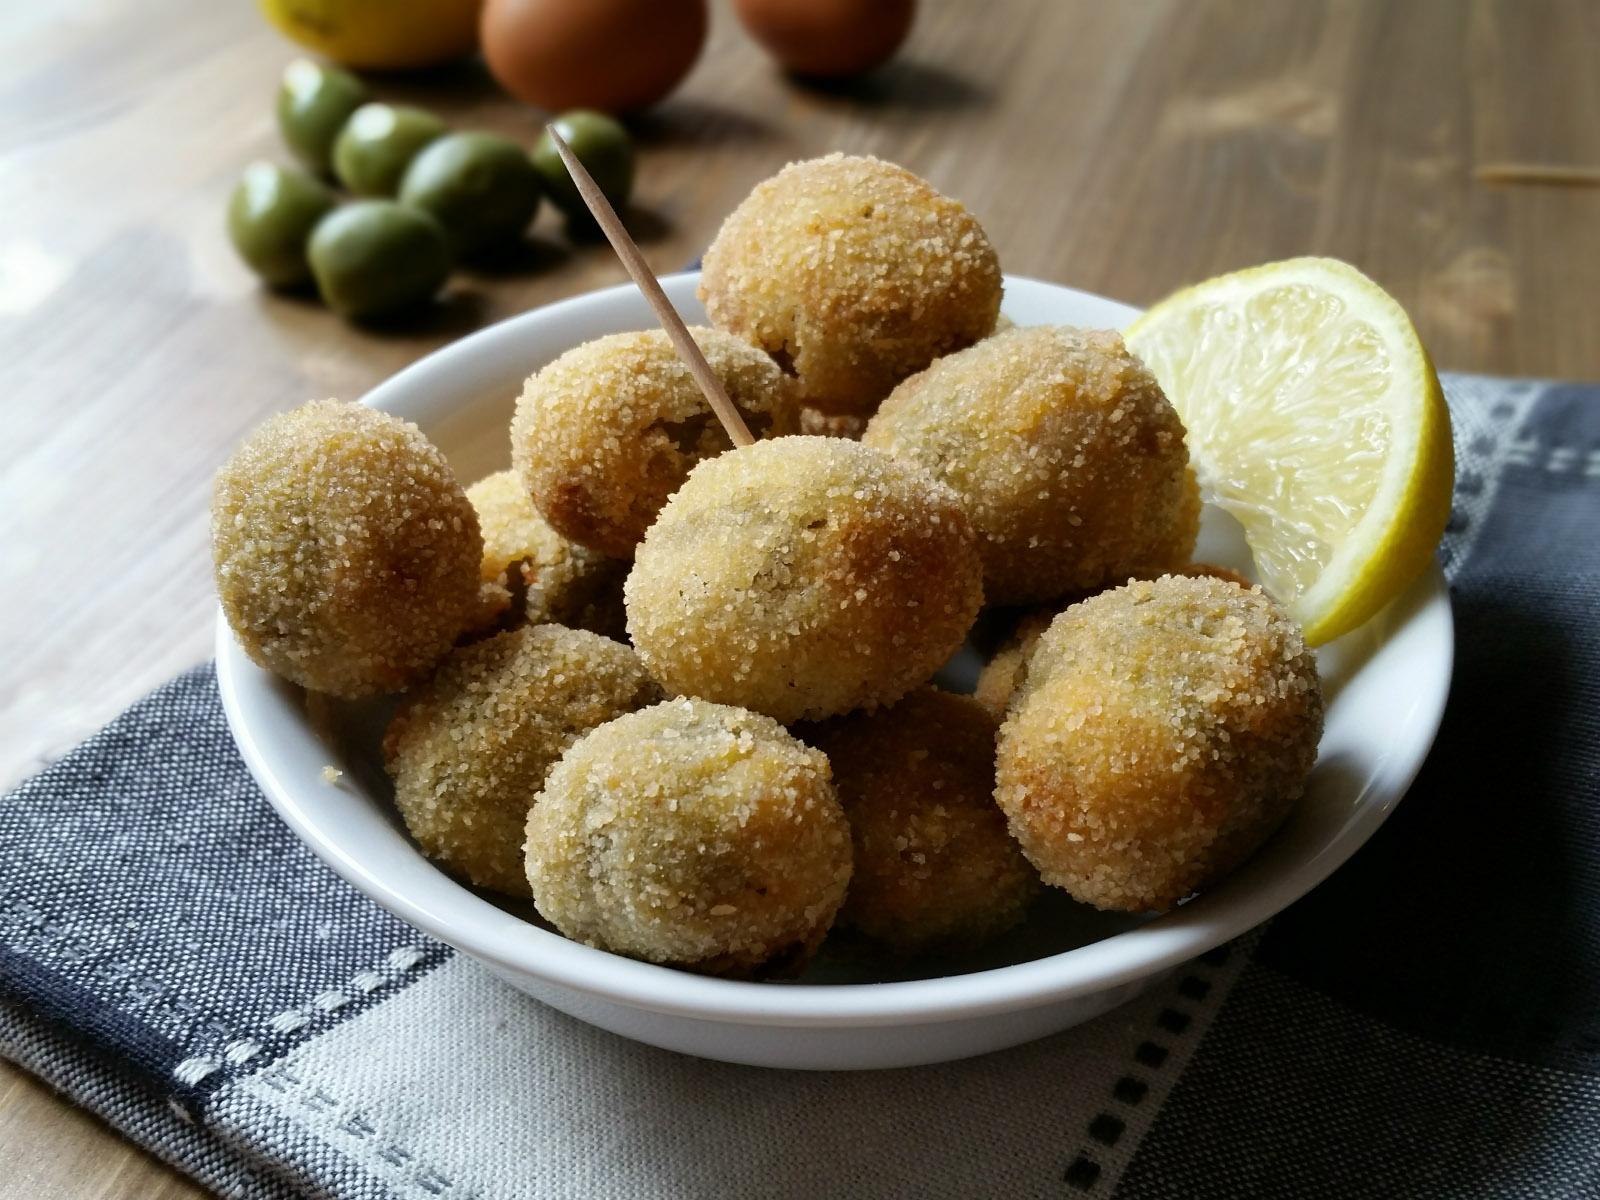 Gran Tour d'Italia, Marche: le olive all'ascolana - AIFB